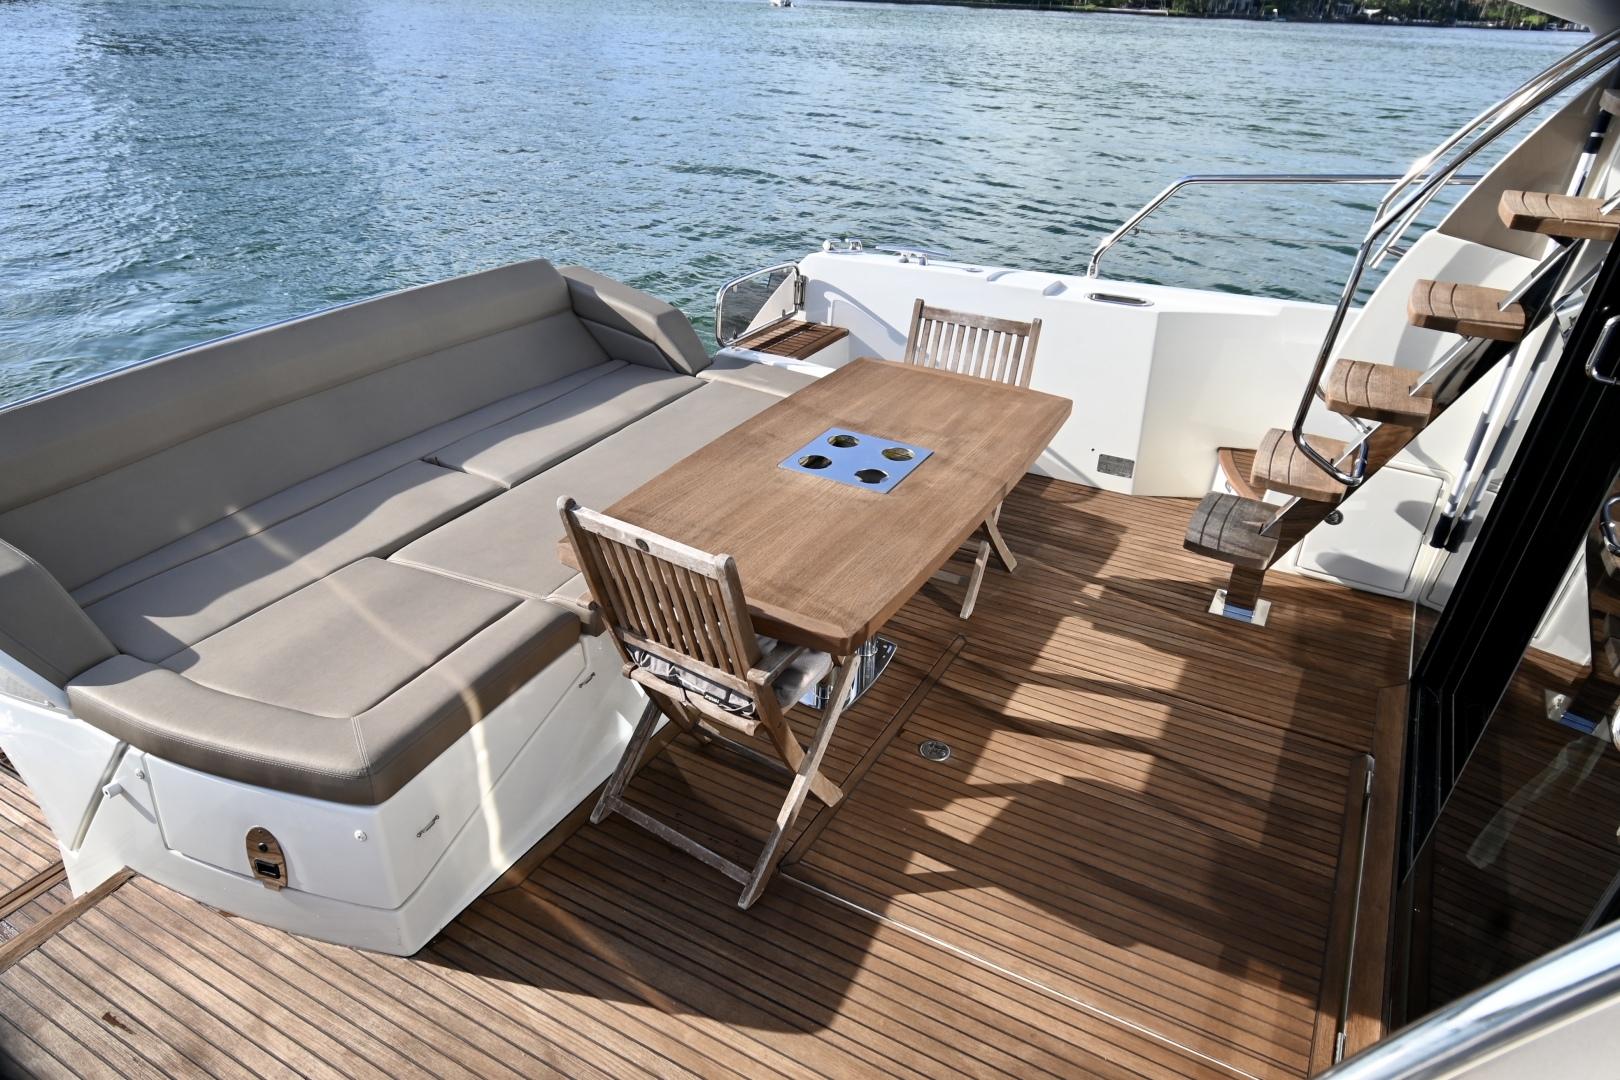 Prestige-550S 2015-Nolina II Hollywood-Florida-United States-1479453 | Thumbnail